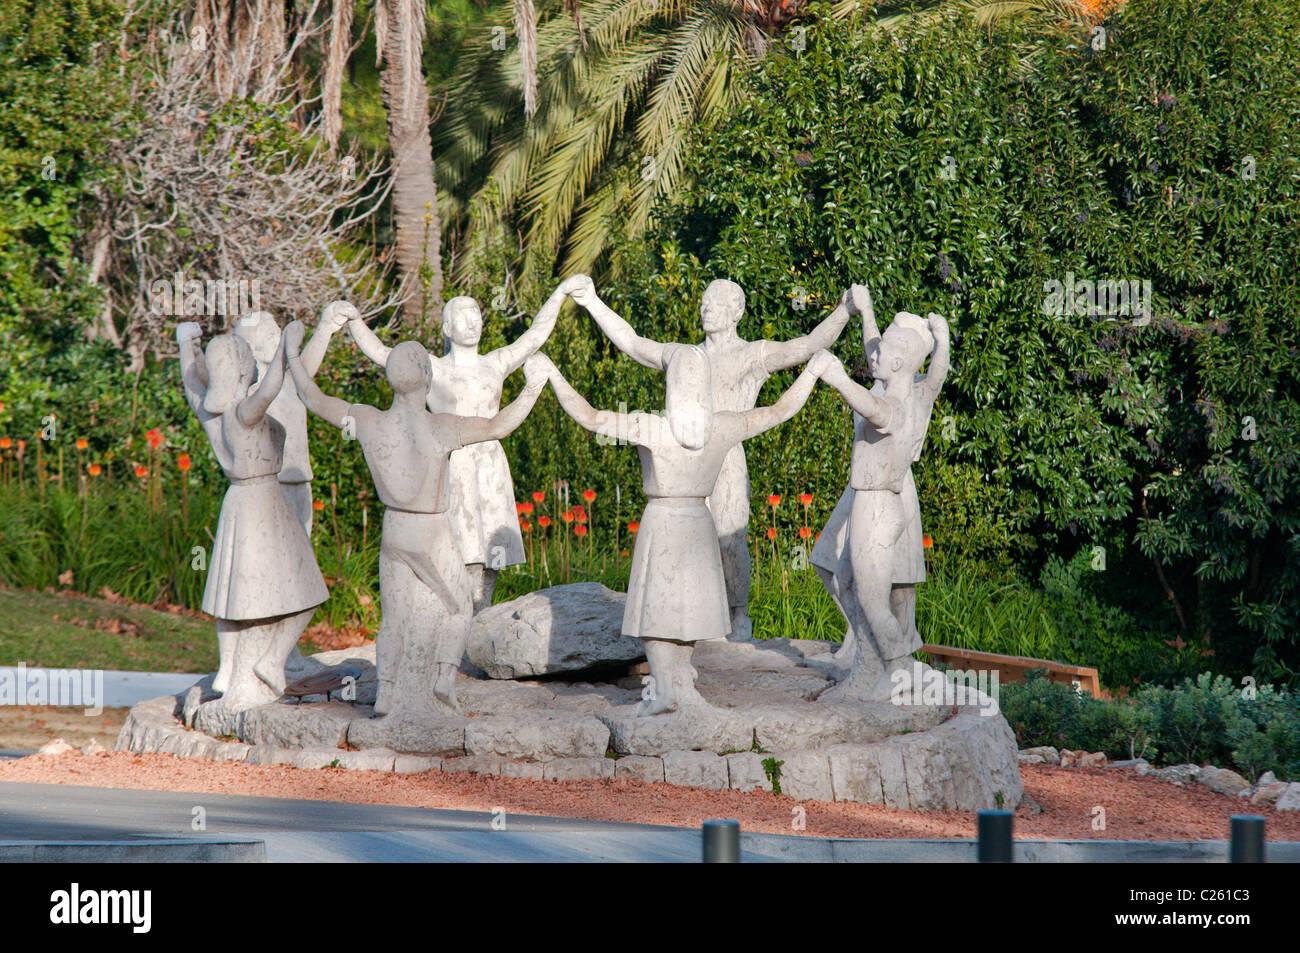 Sardana Statues Mont Juic ,Barcelona,Catalunya,Spain - Stock Image